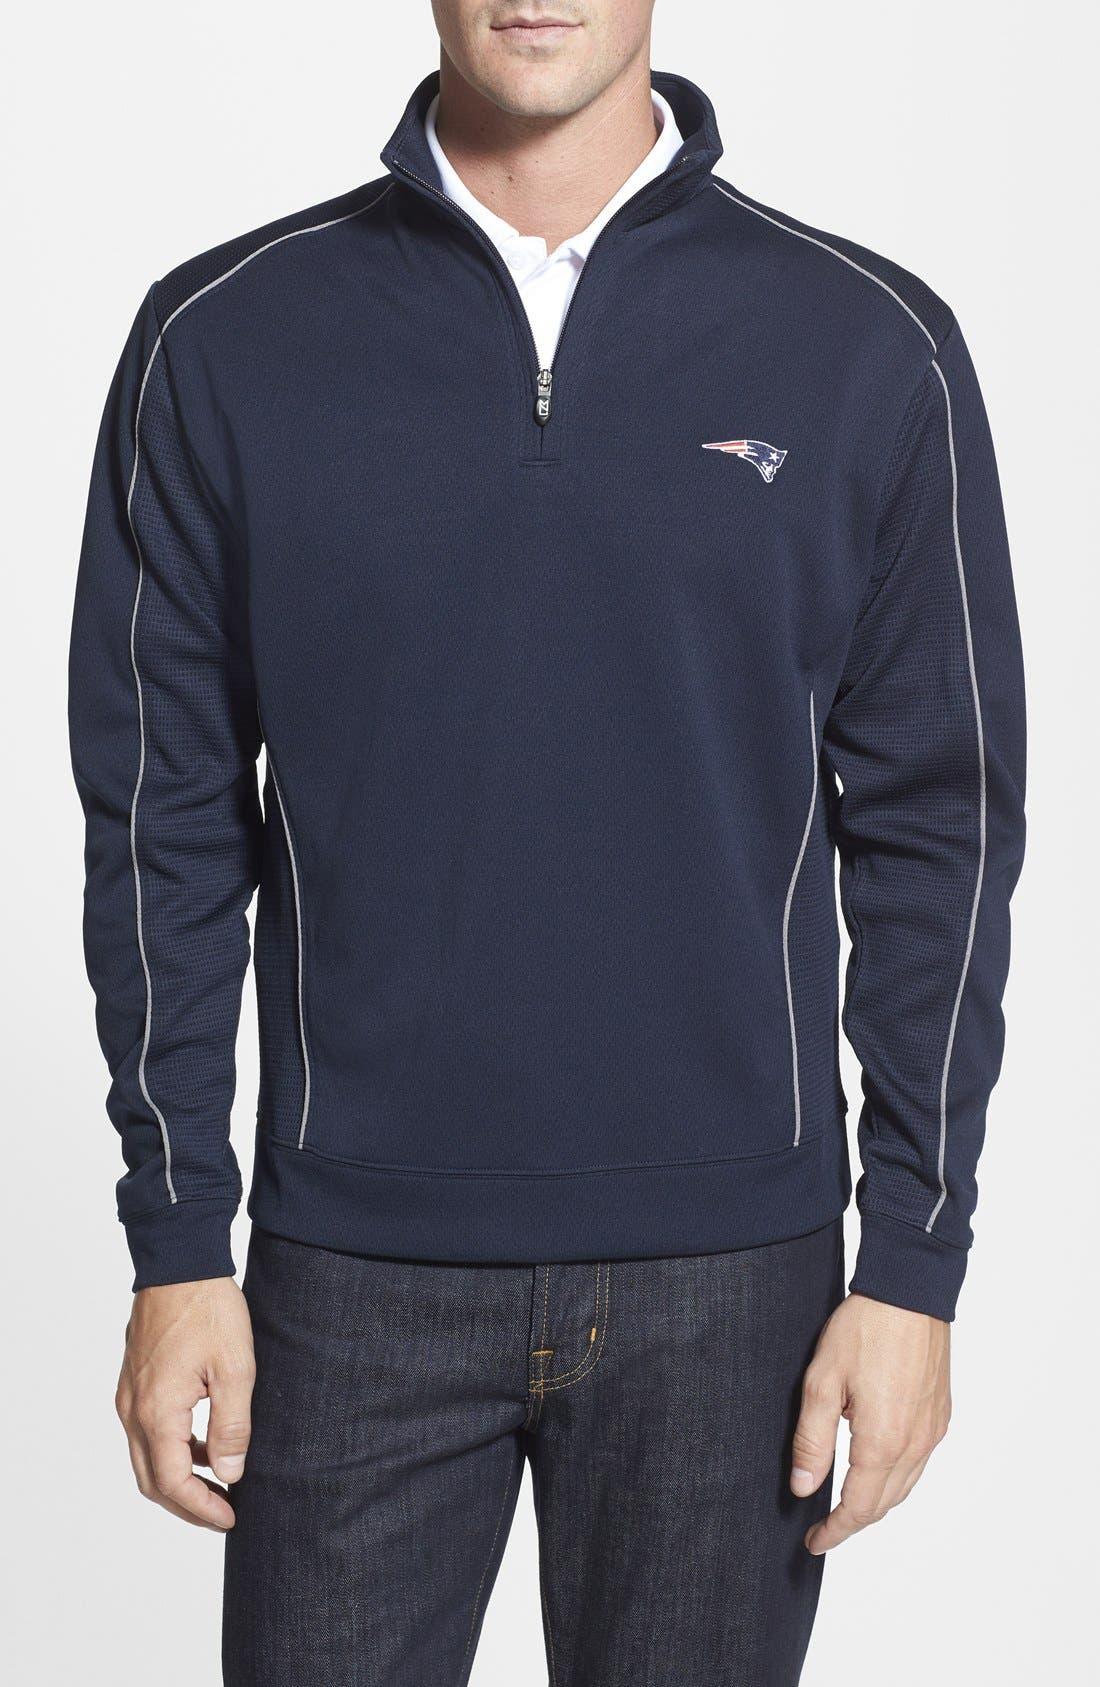 New England Patriots - Edge DryTec Moisture Wicking Half Zip Pullover,                         Main,                         color, 420